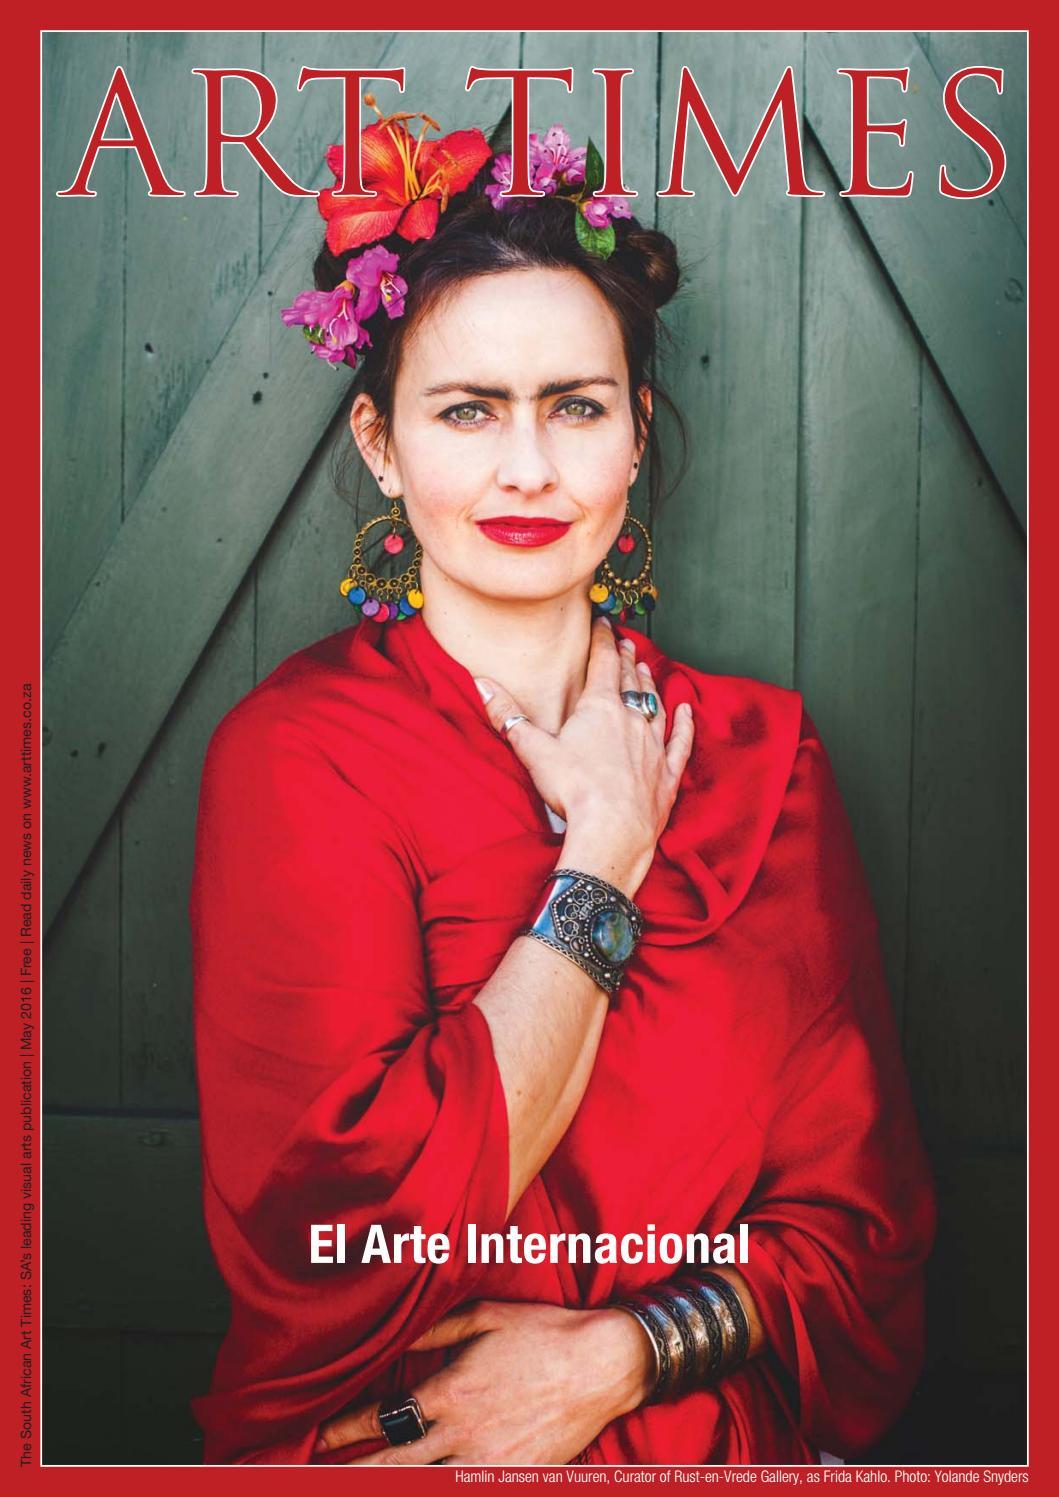 Sa Art Times May 2016 By Sa Art Times Issuu